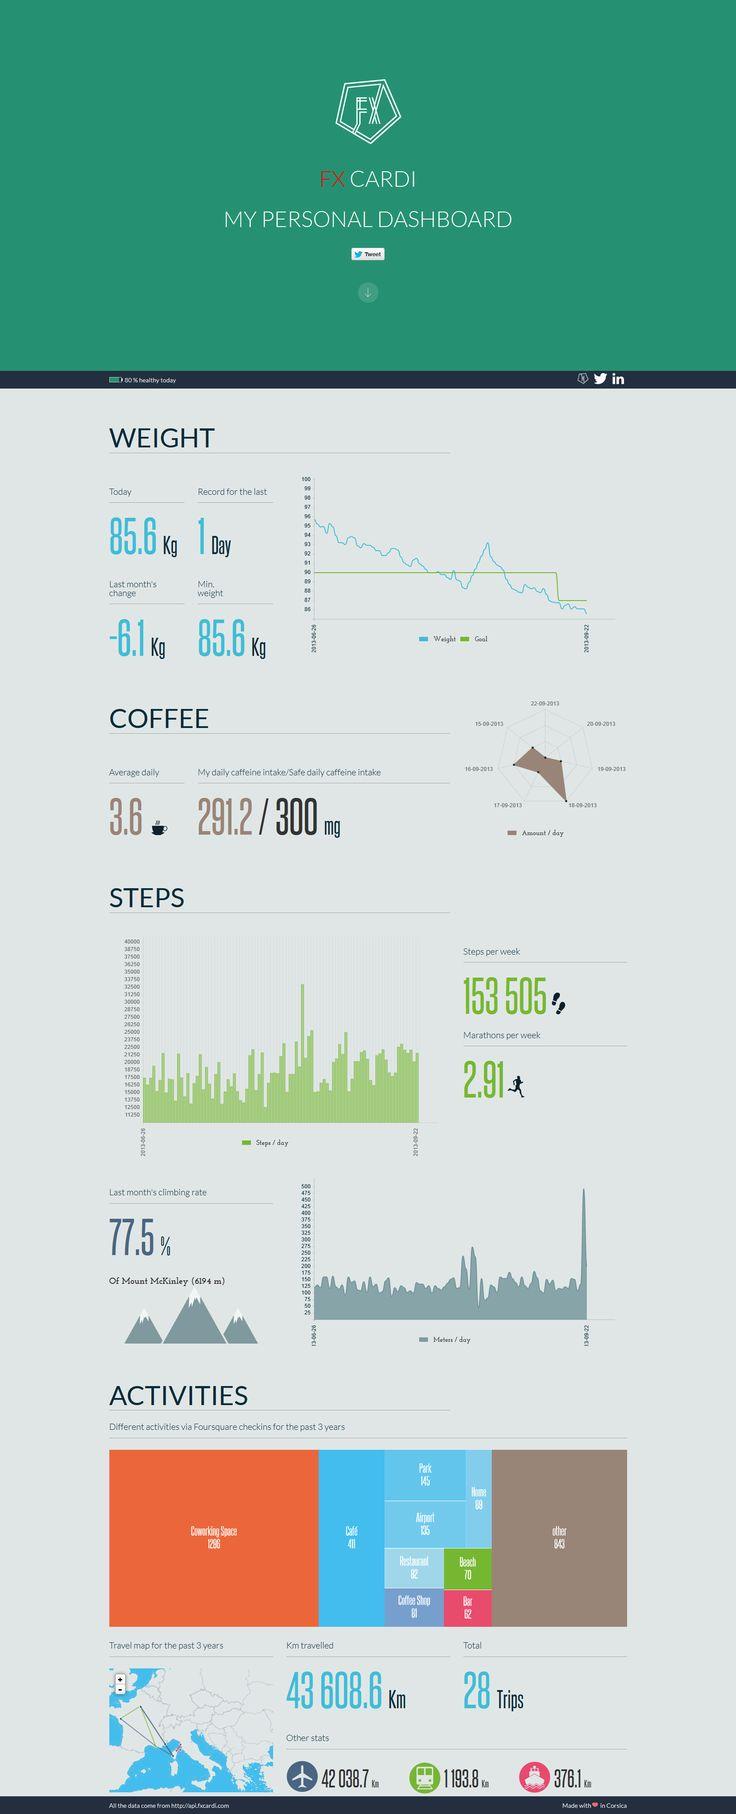 Personal data dashboard by FXCardi